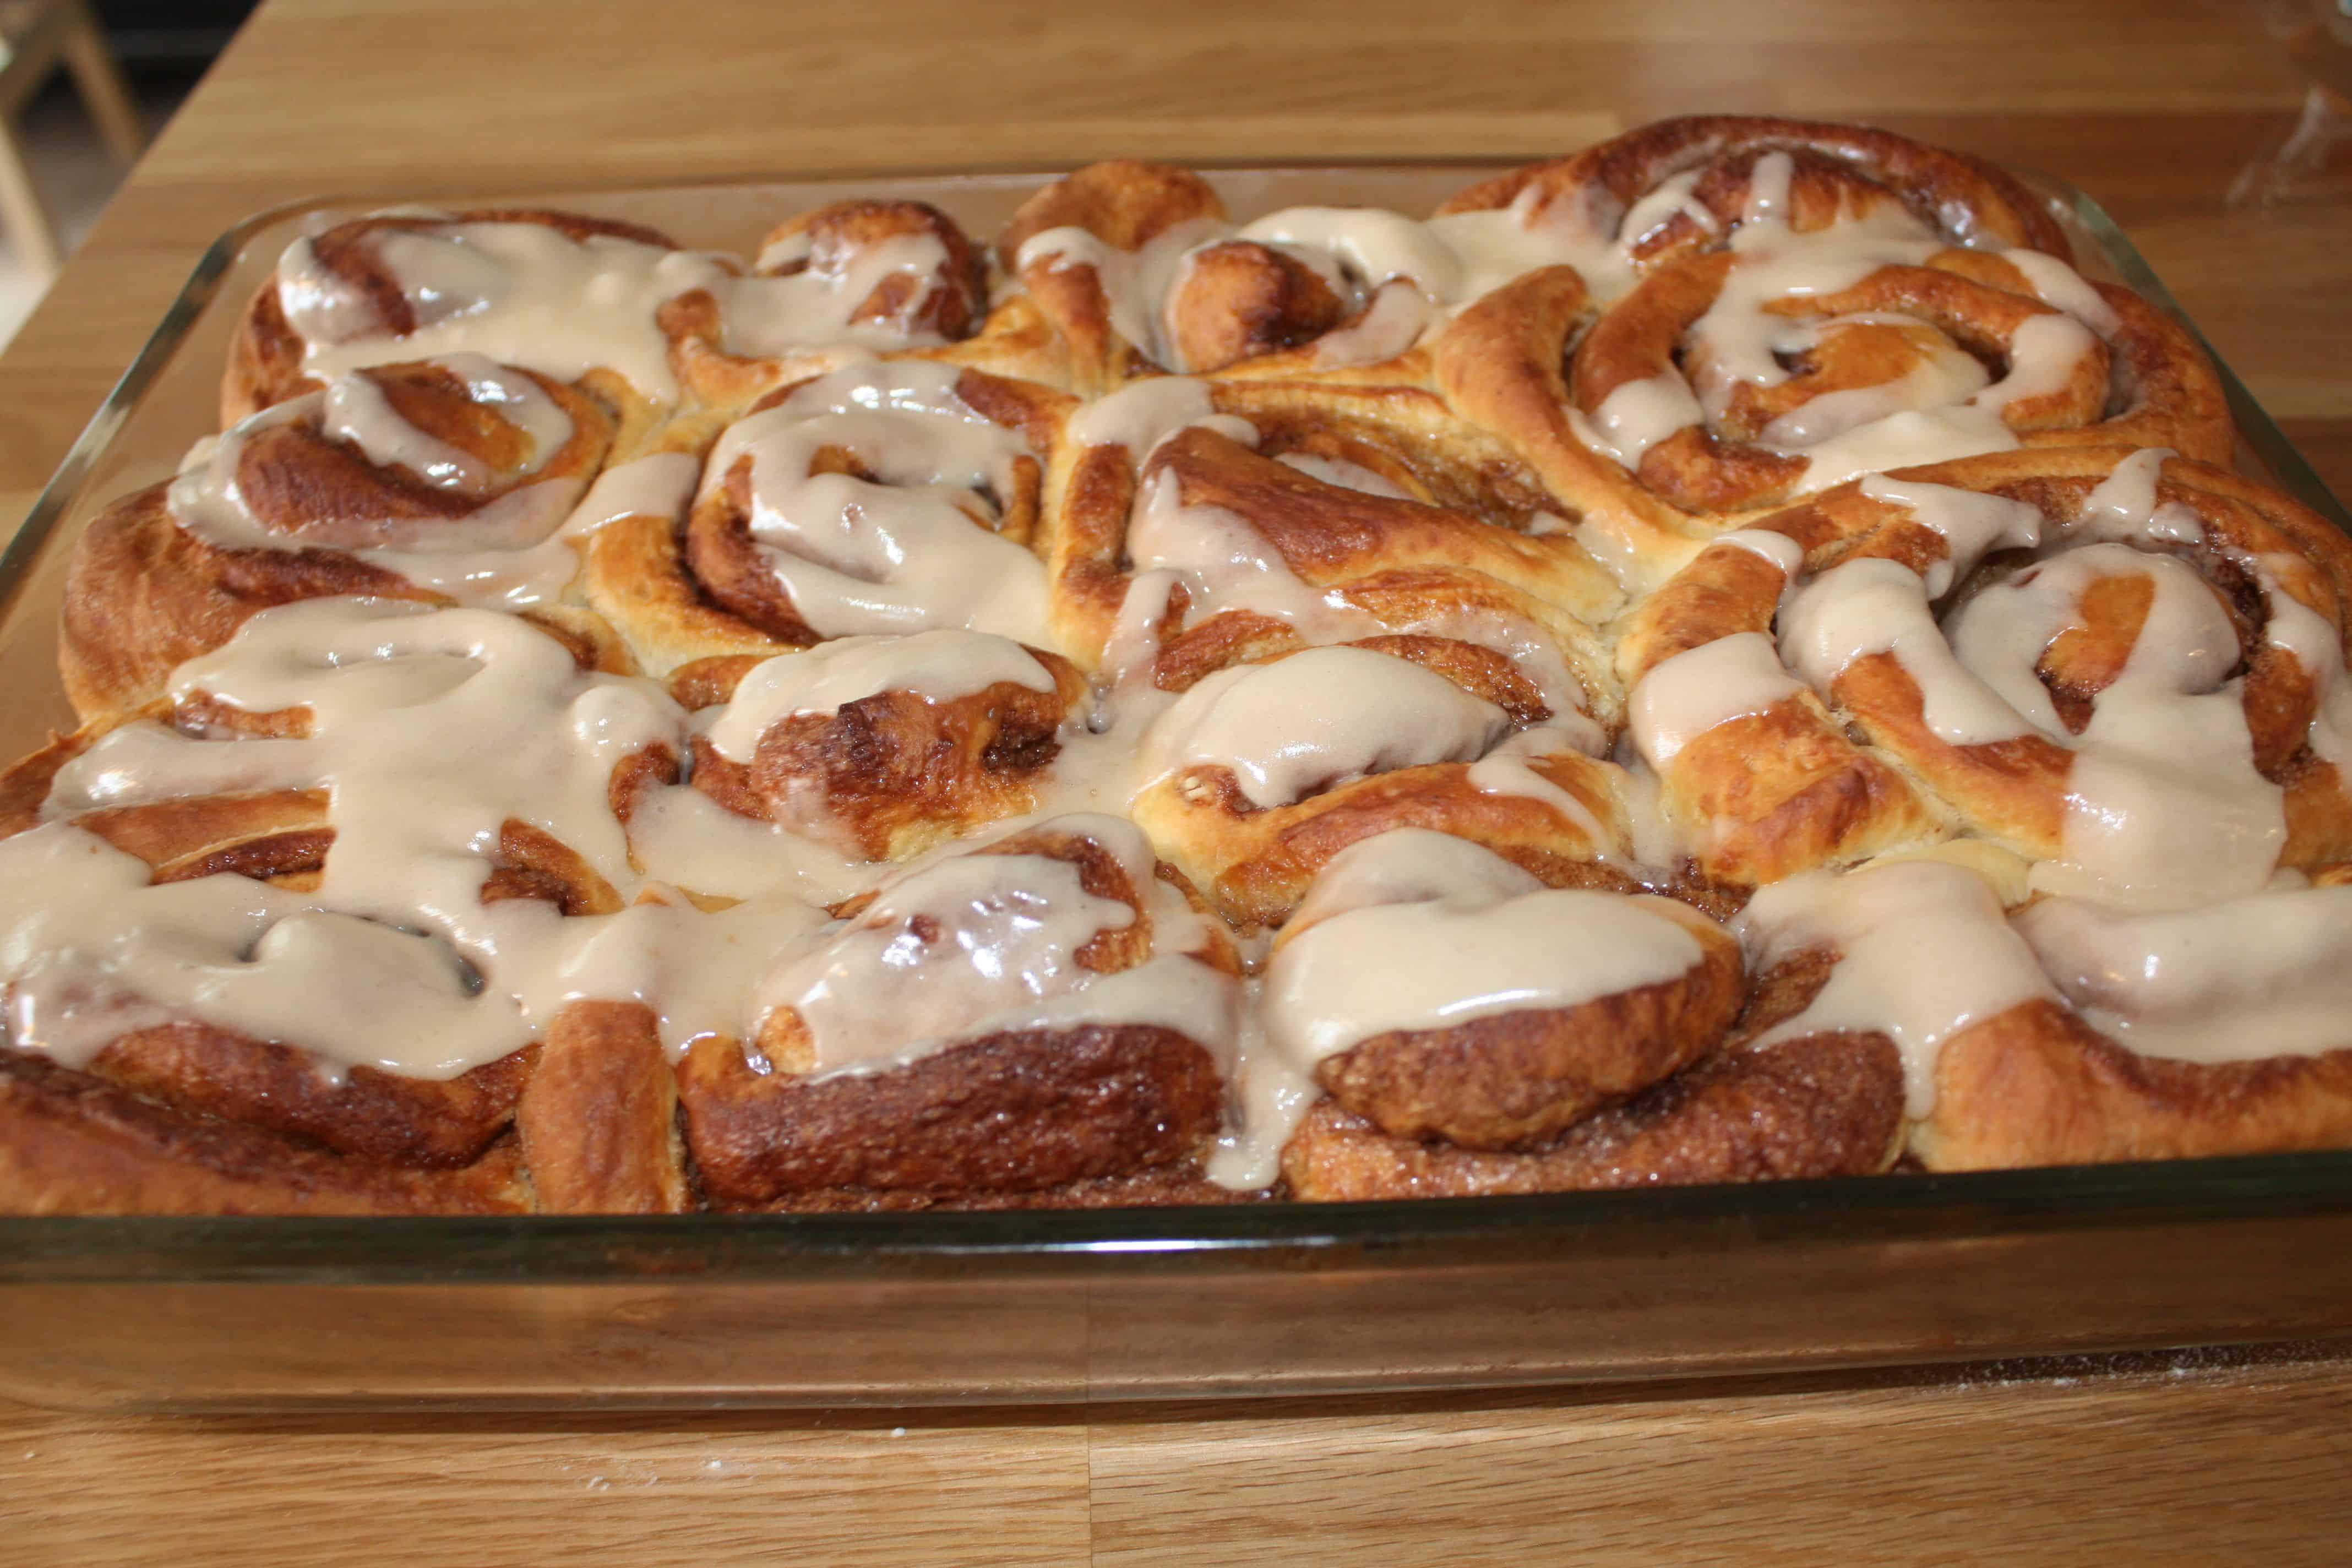 Kanelsnegle – Cinnamon rolls